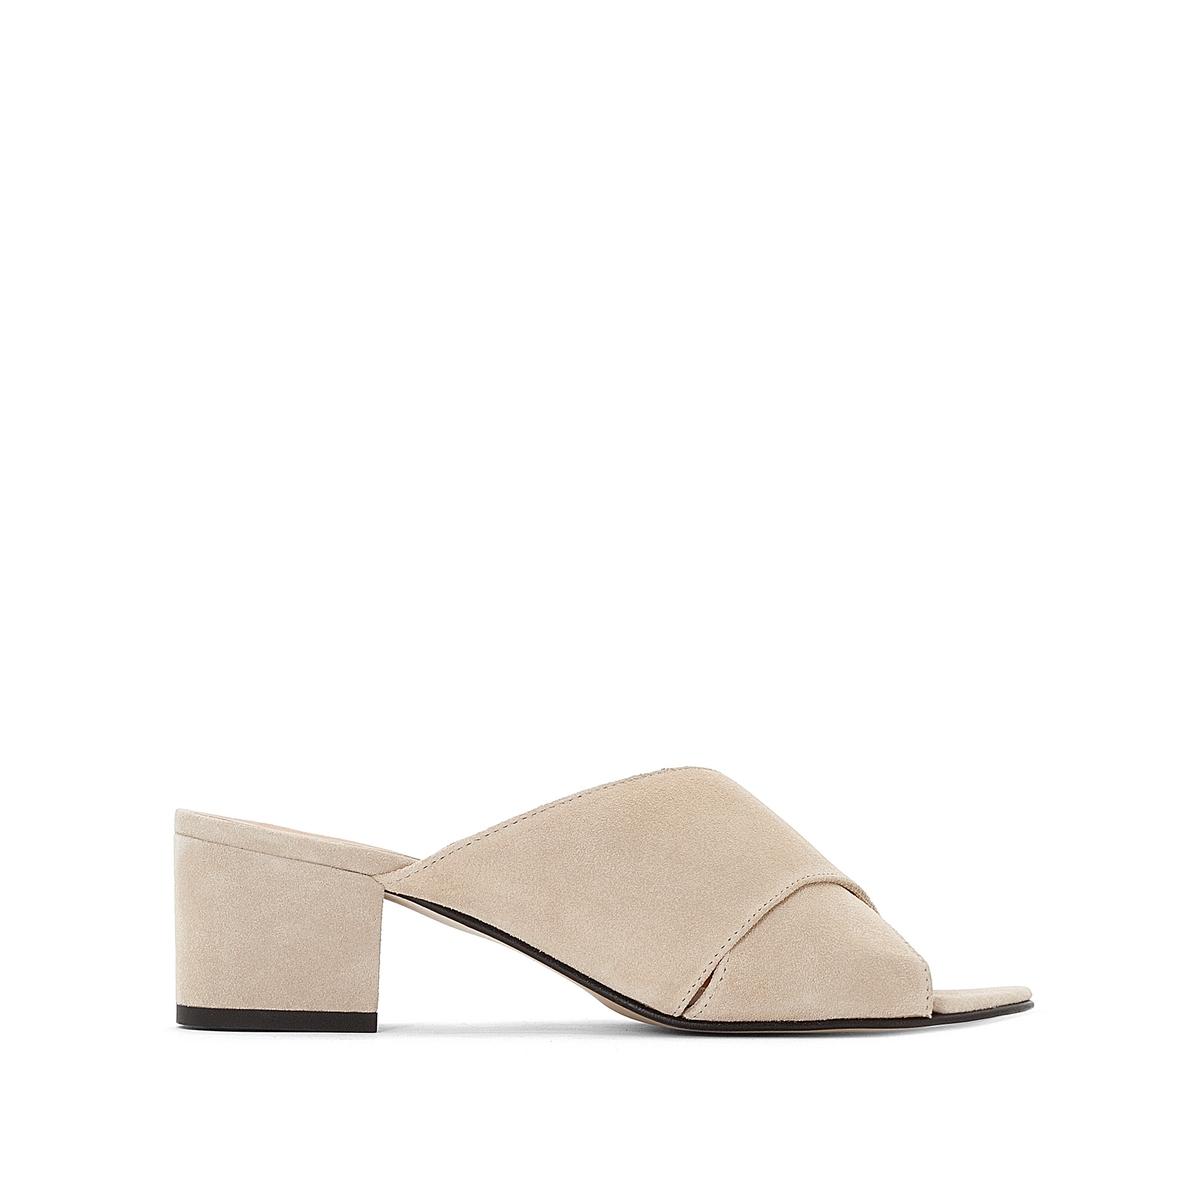 Туфли замшевые без задника на каблуке Franca